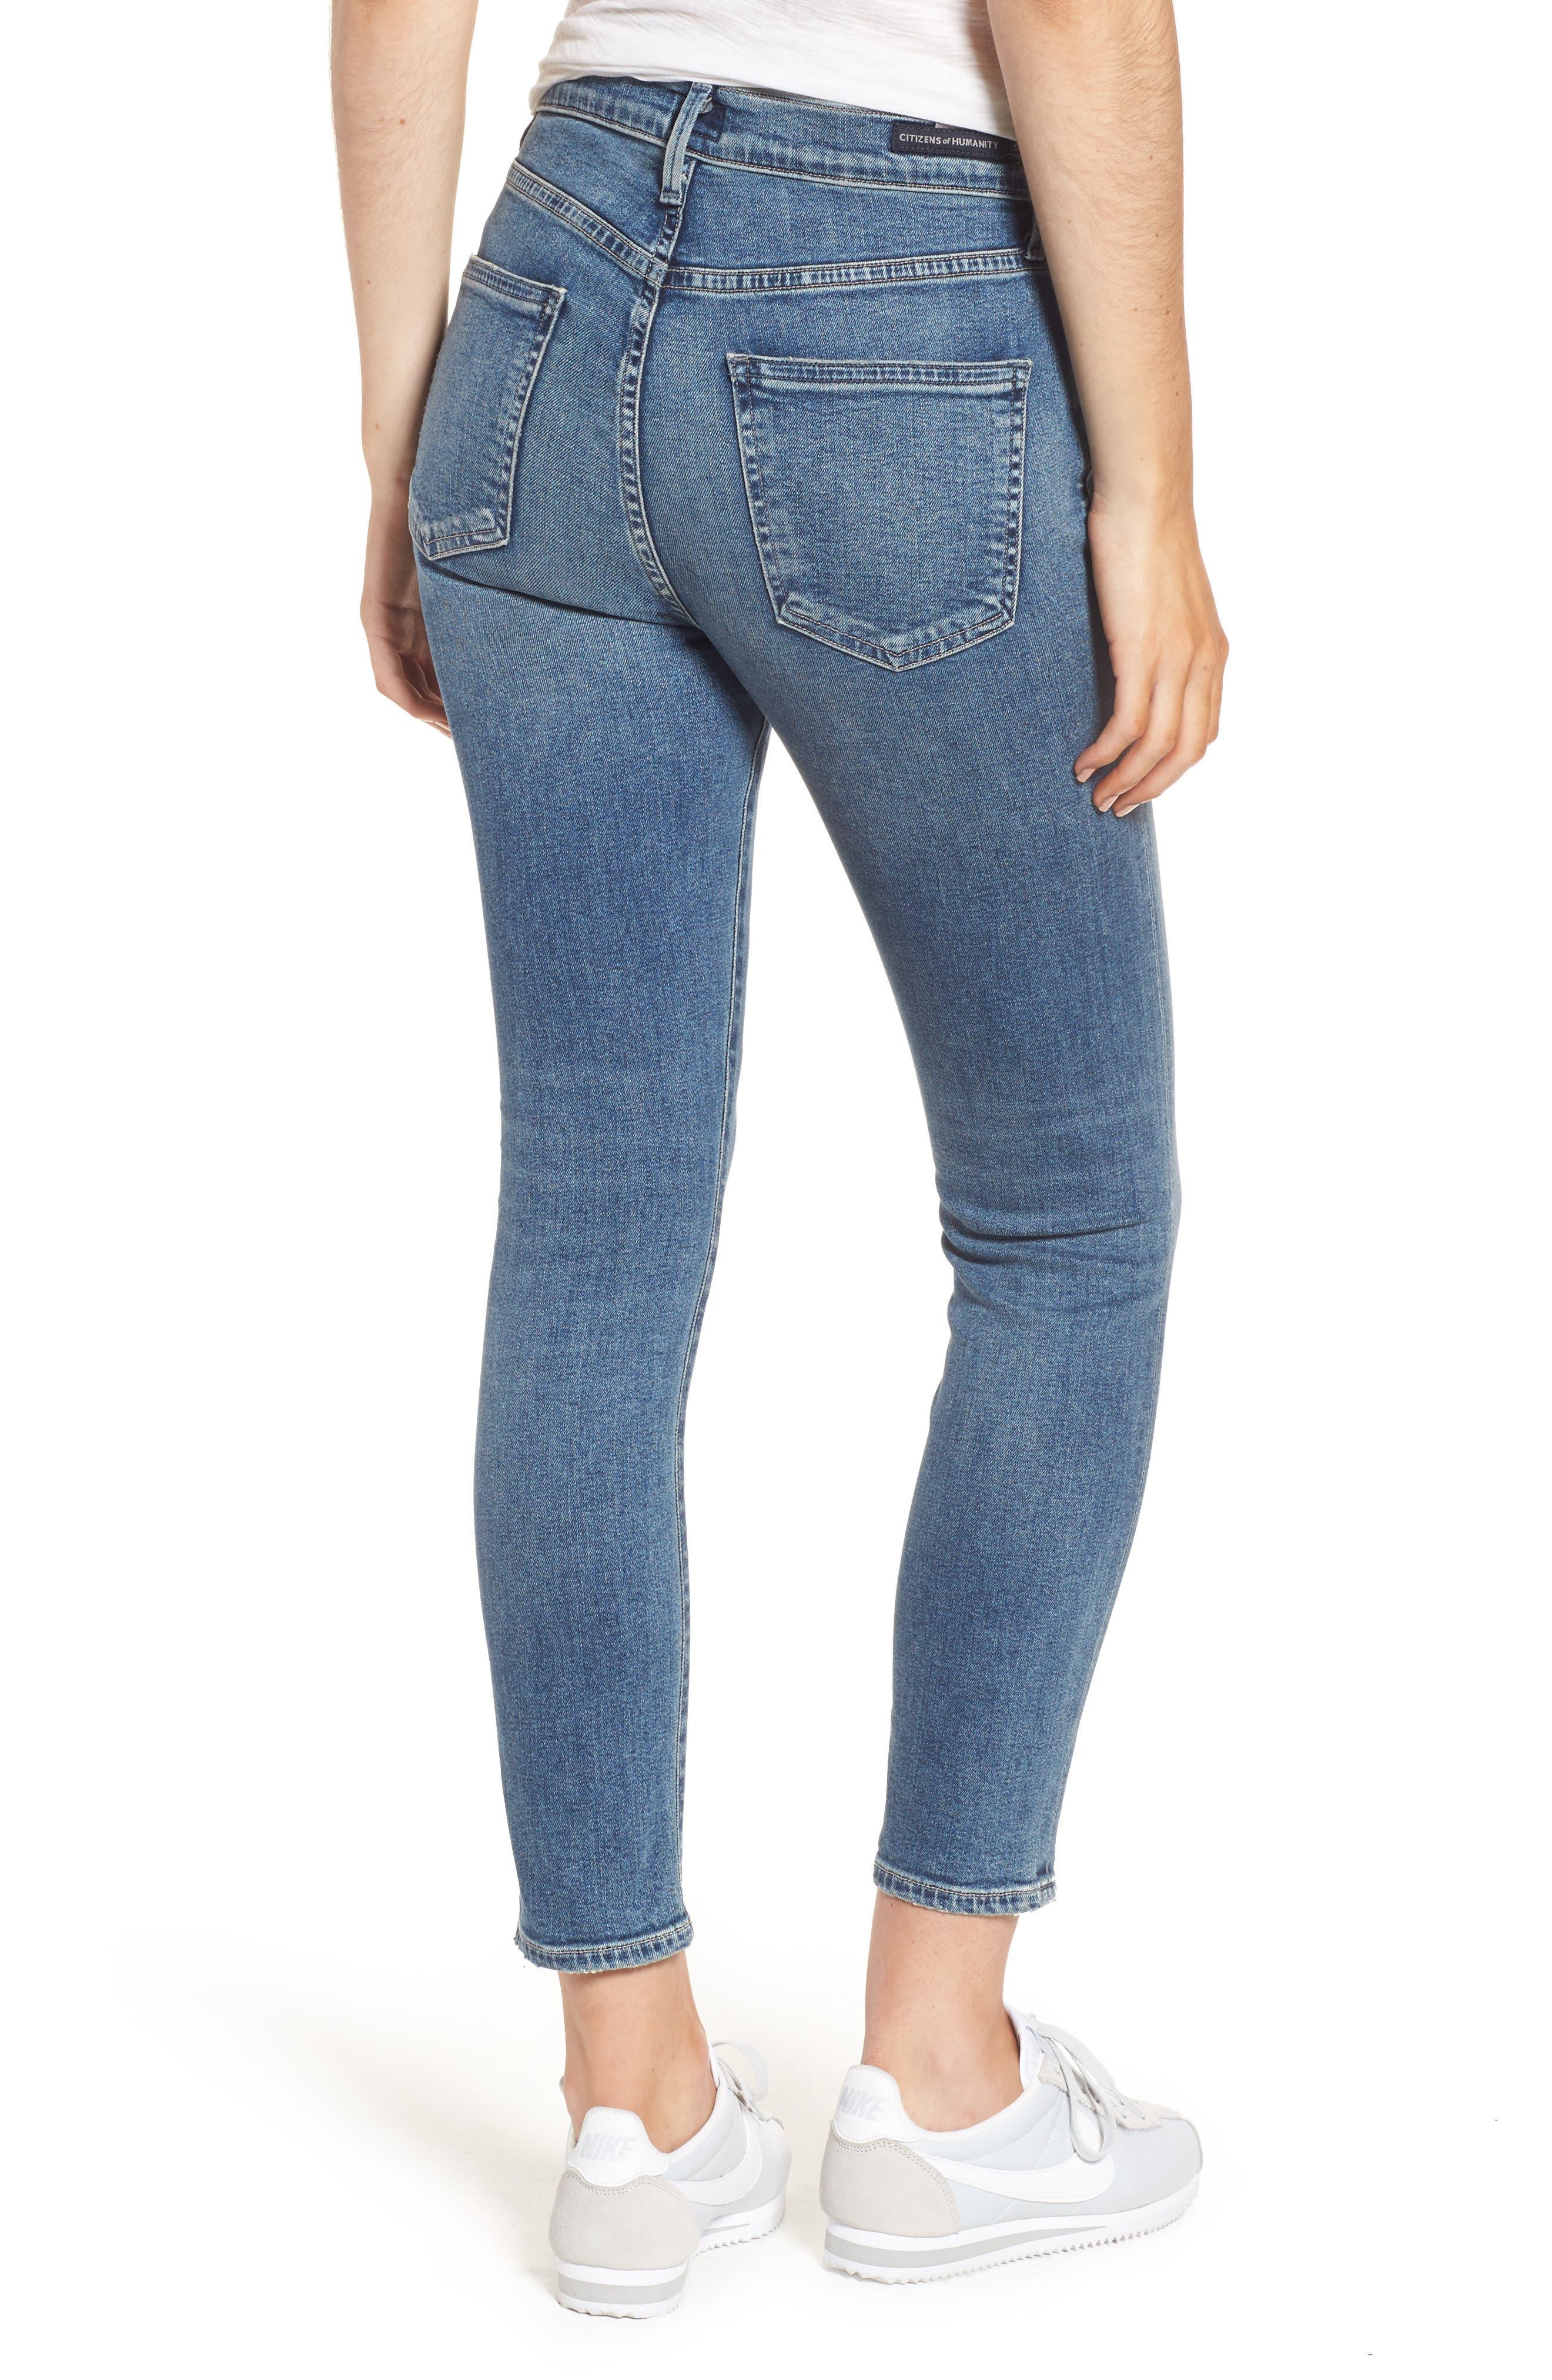 Rocket Crop Skinny Jeans,                             Alternate thumbnail 2, color,